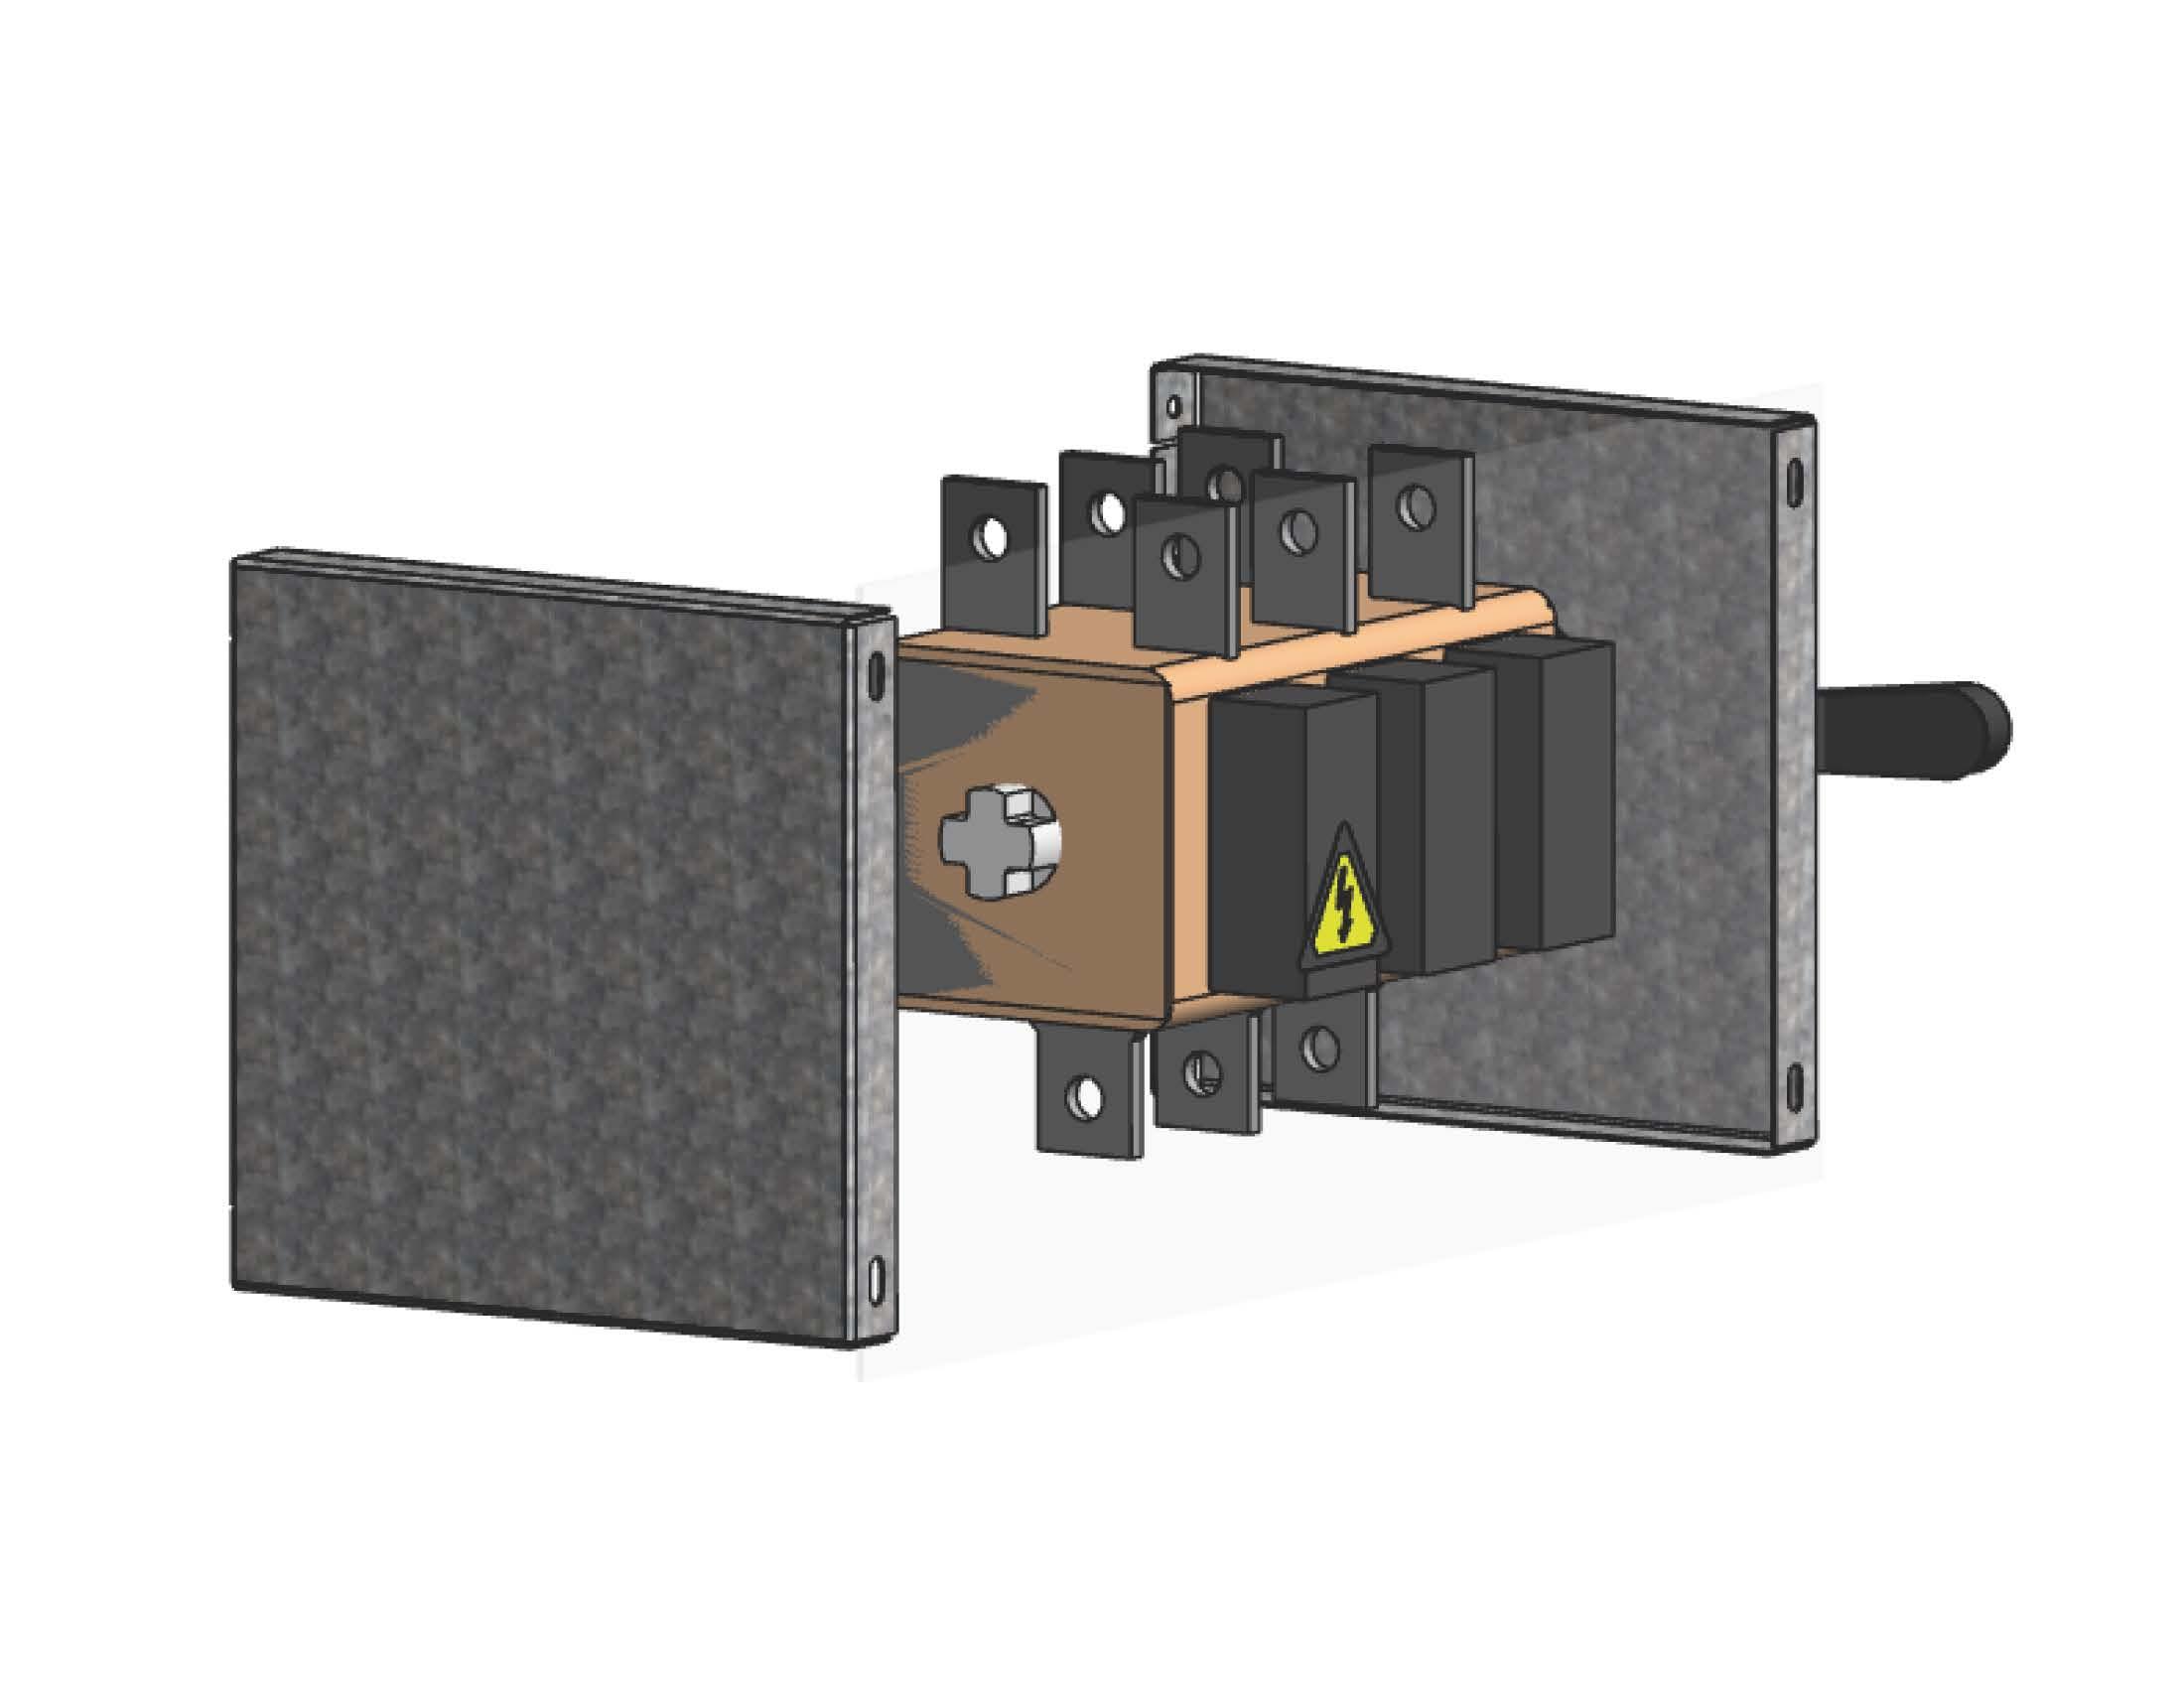 Экран для кожуха рубильника для ВРУ Unit шириной 450ммEKF PROxima